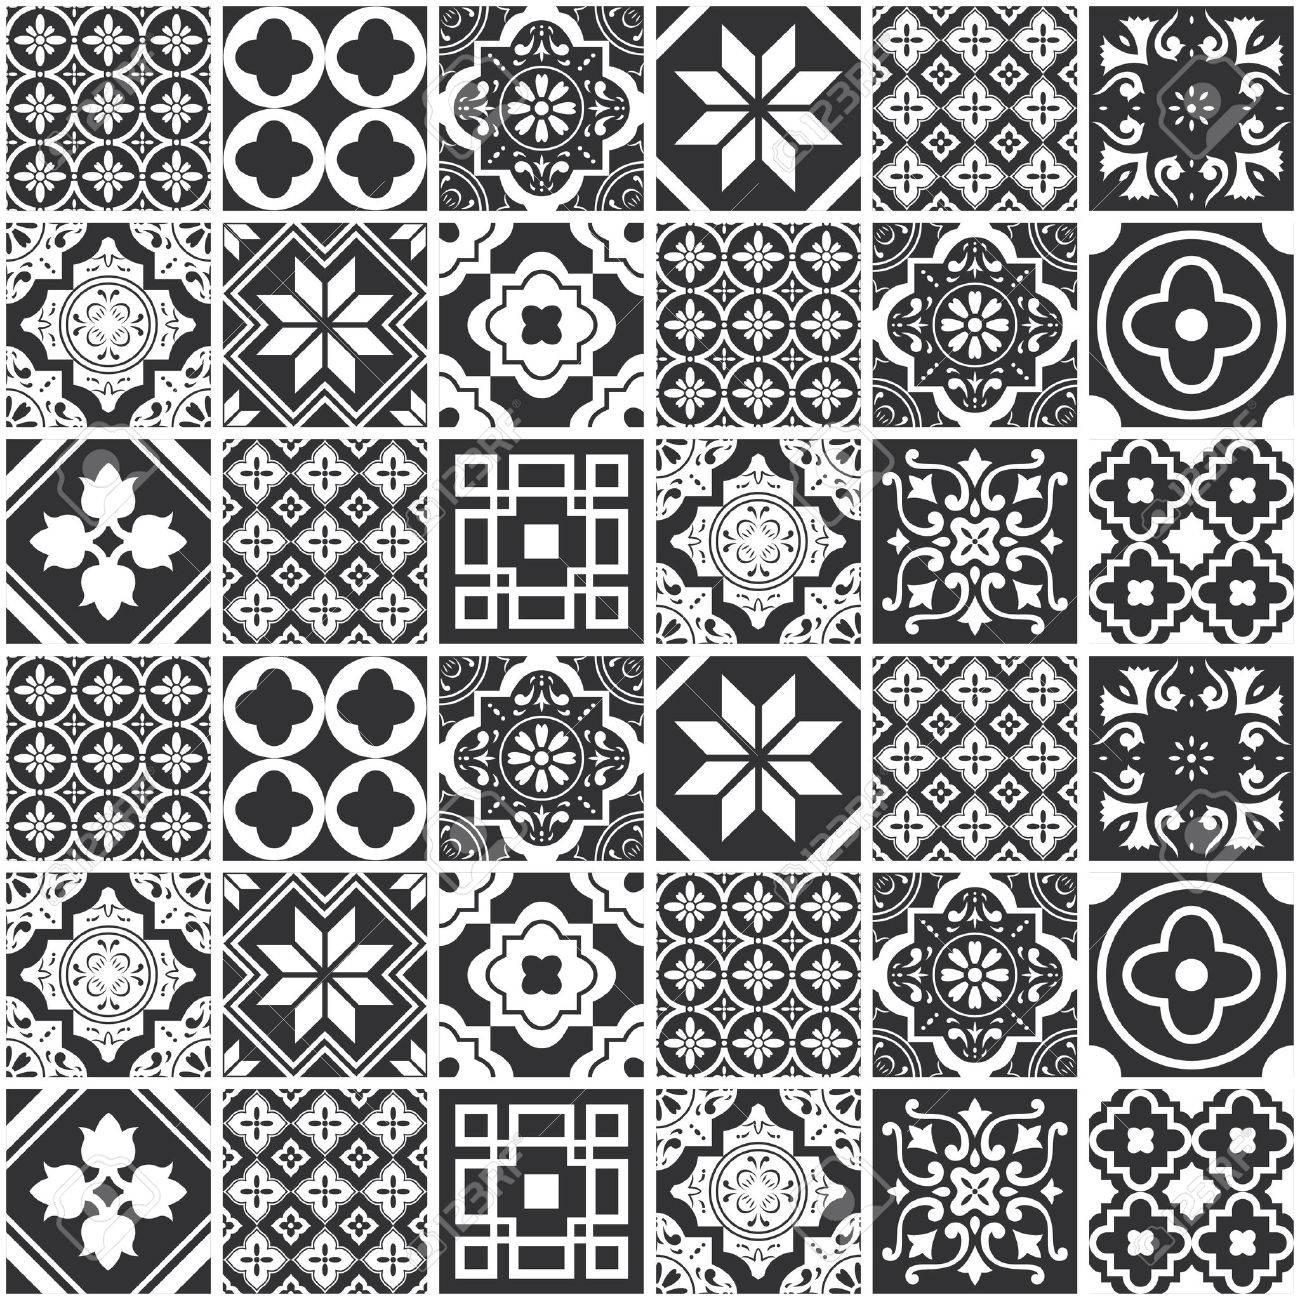 Decorative monochrome tile pattern design. Vector illustration. - 68119230